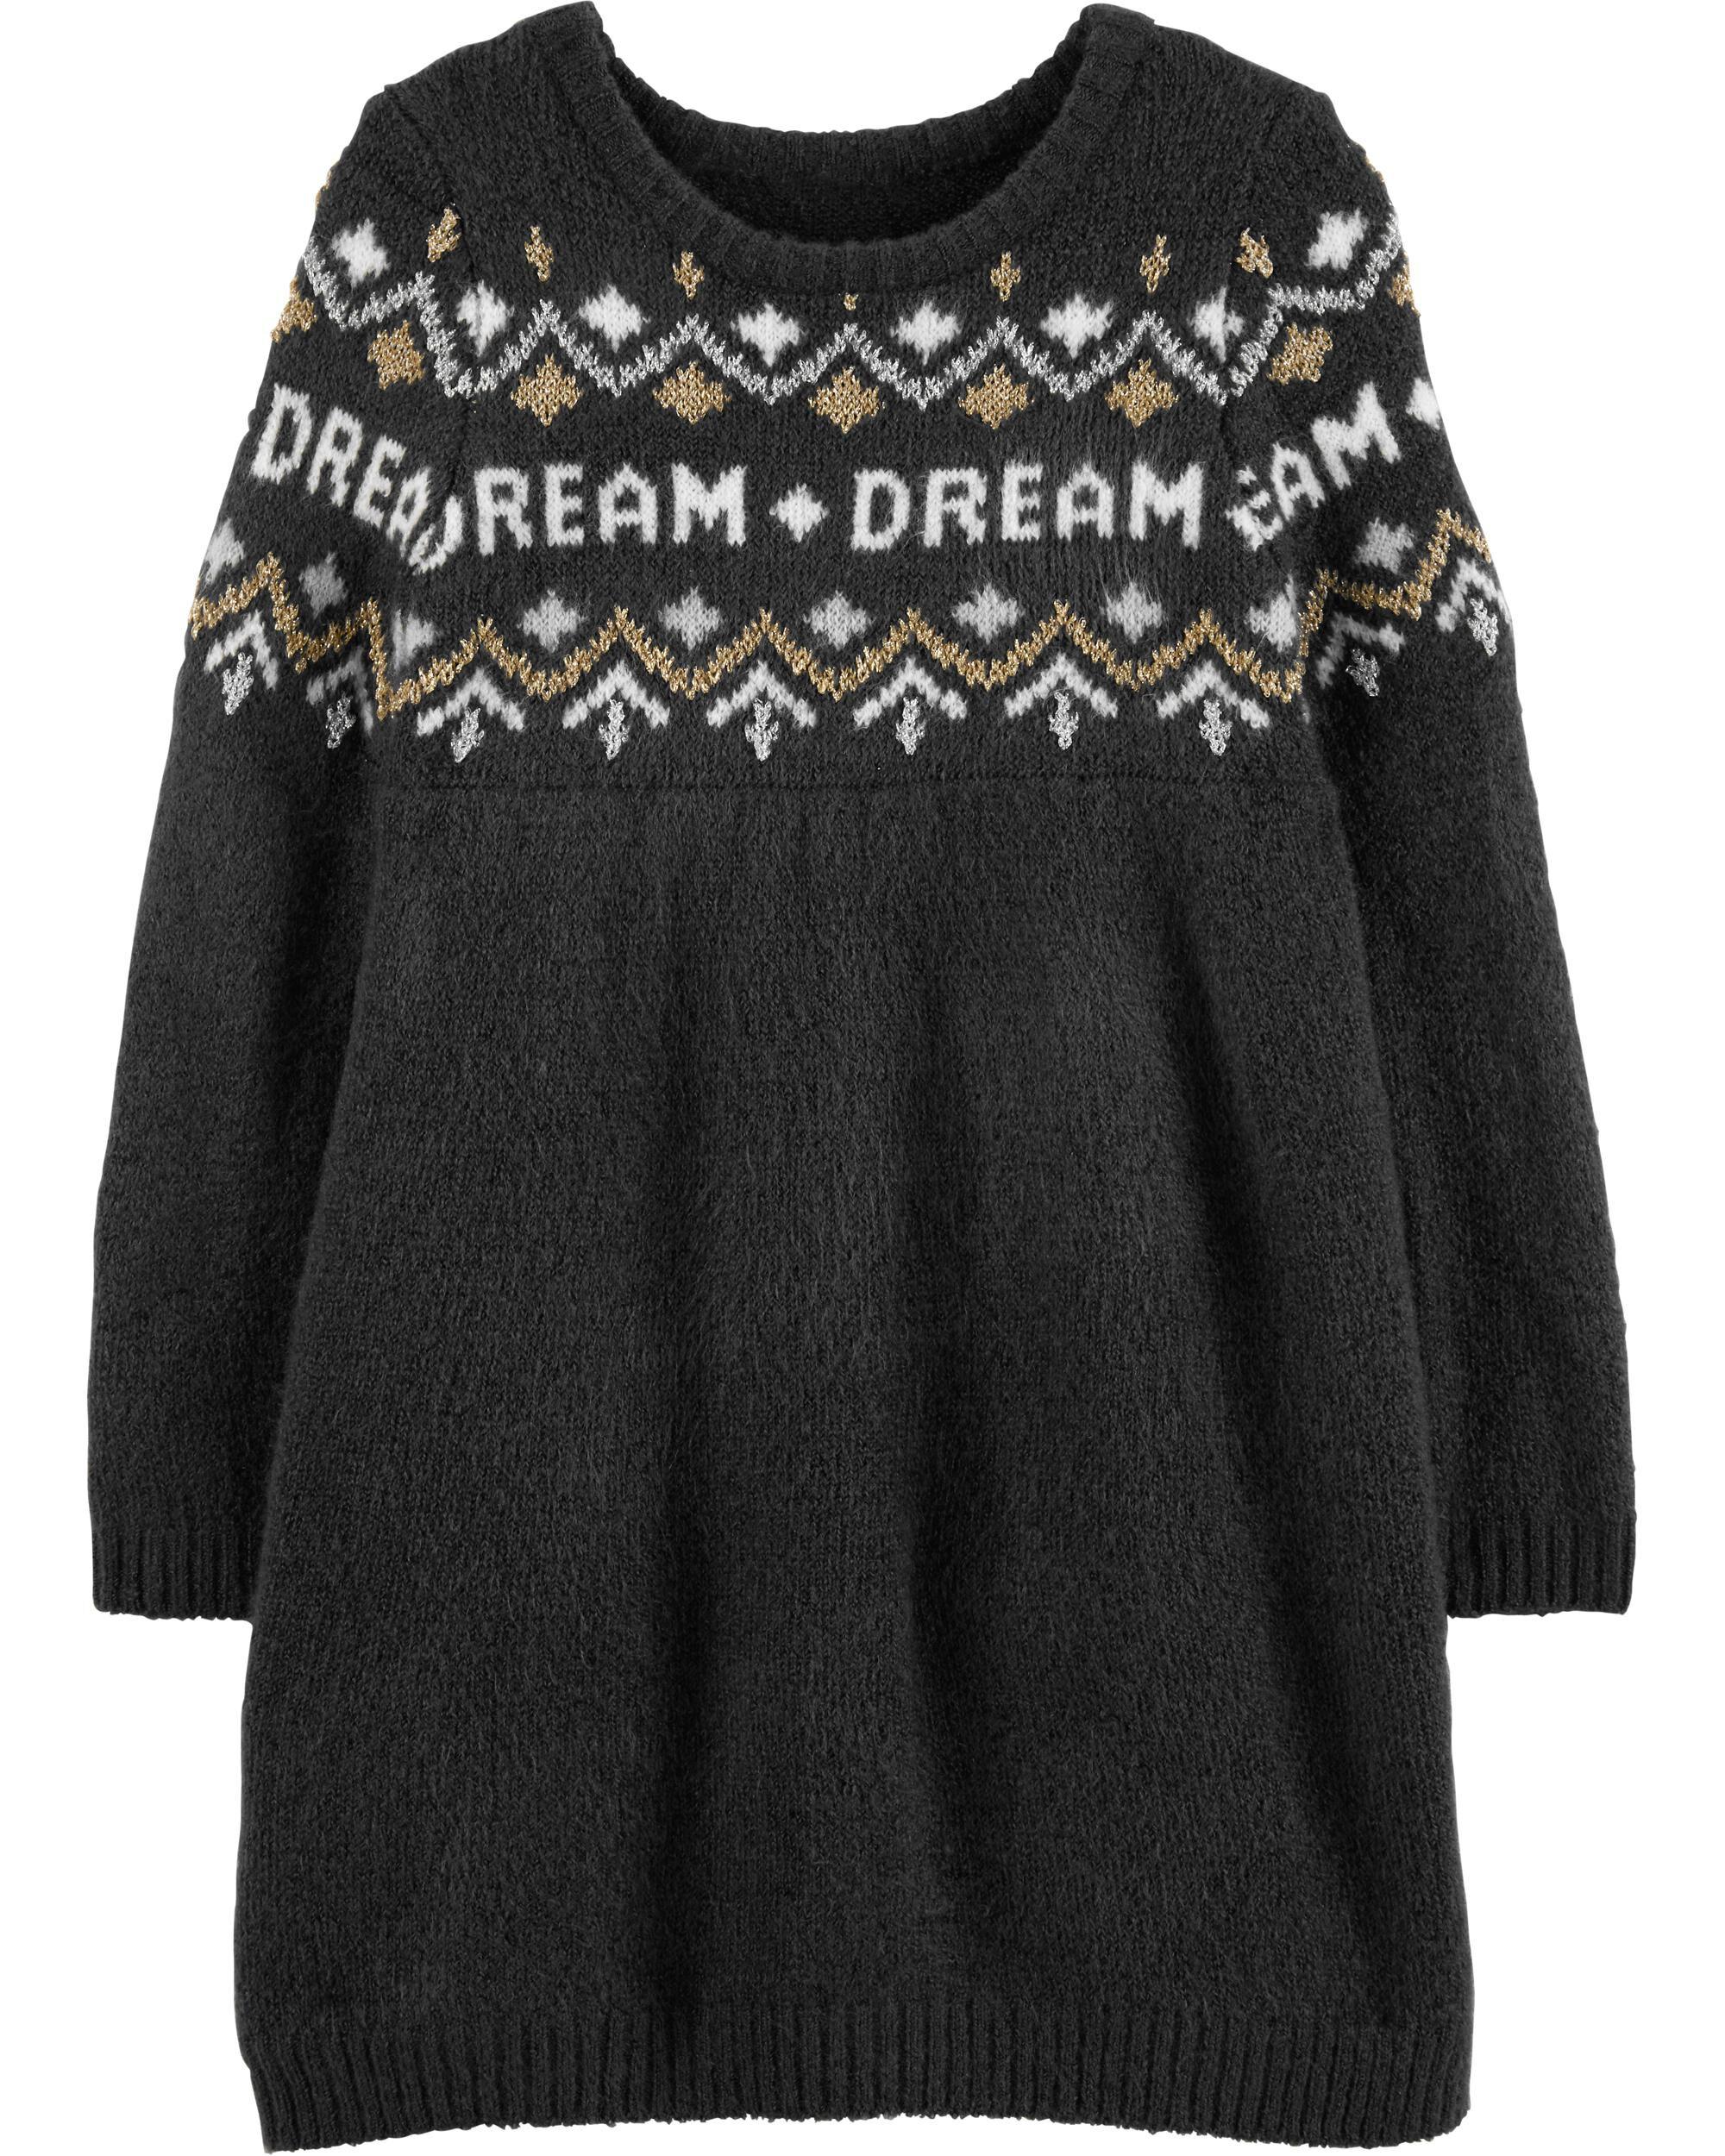 Black U-Knit Toddler Girls/' Faux Fur Hearts Sweater Dress 2T